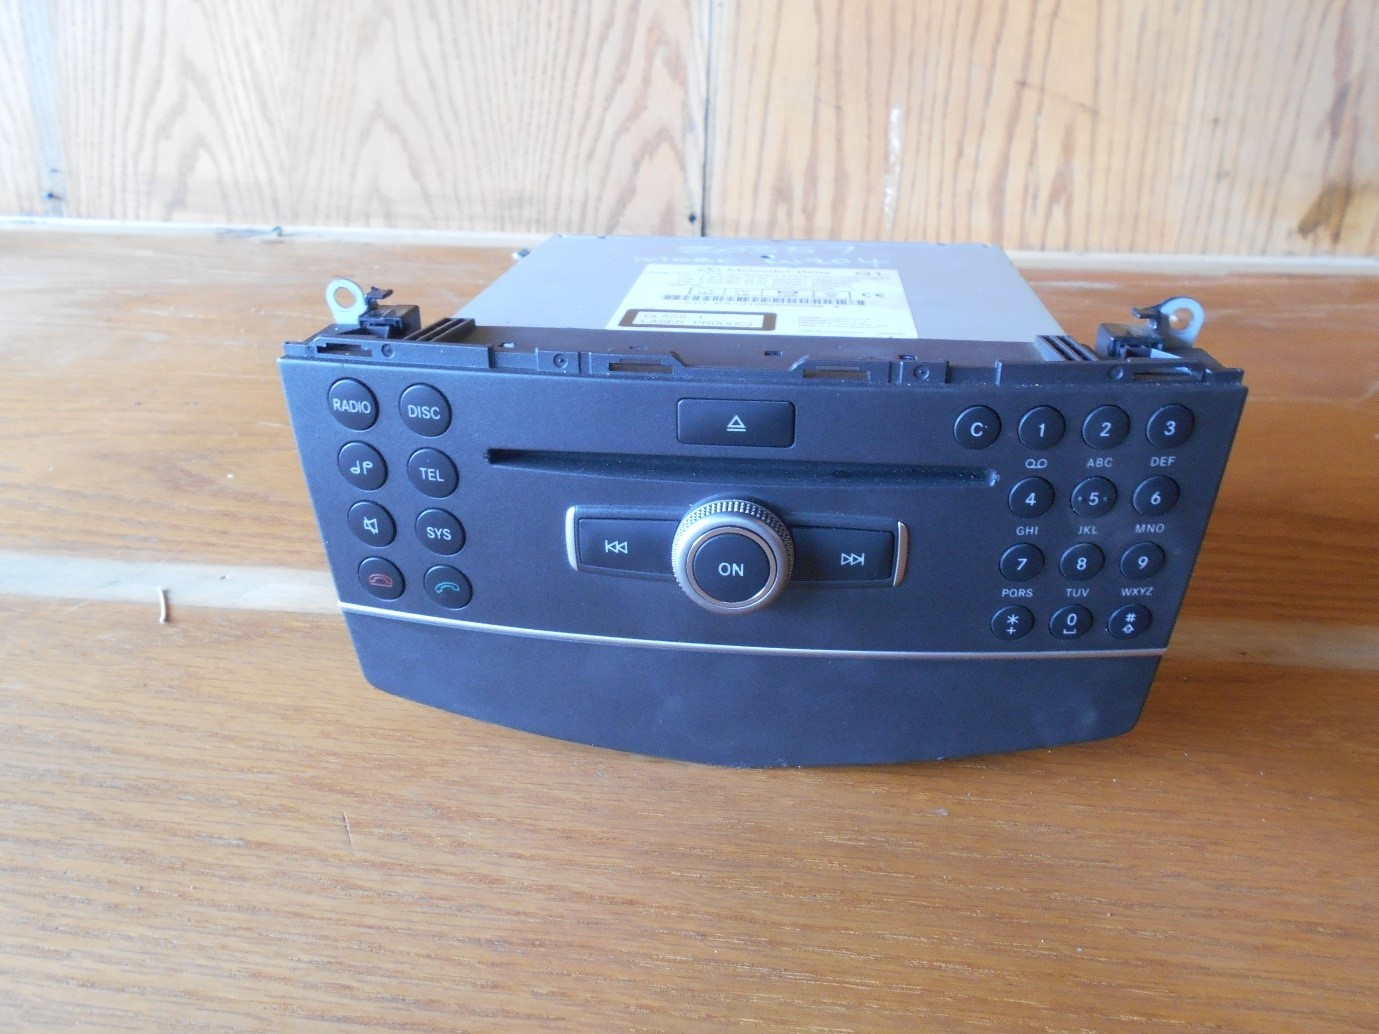 Mercedes Benz W204 Radio For Sale | Junk Mail